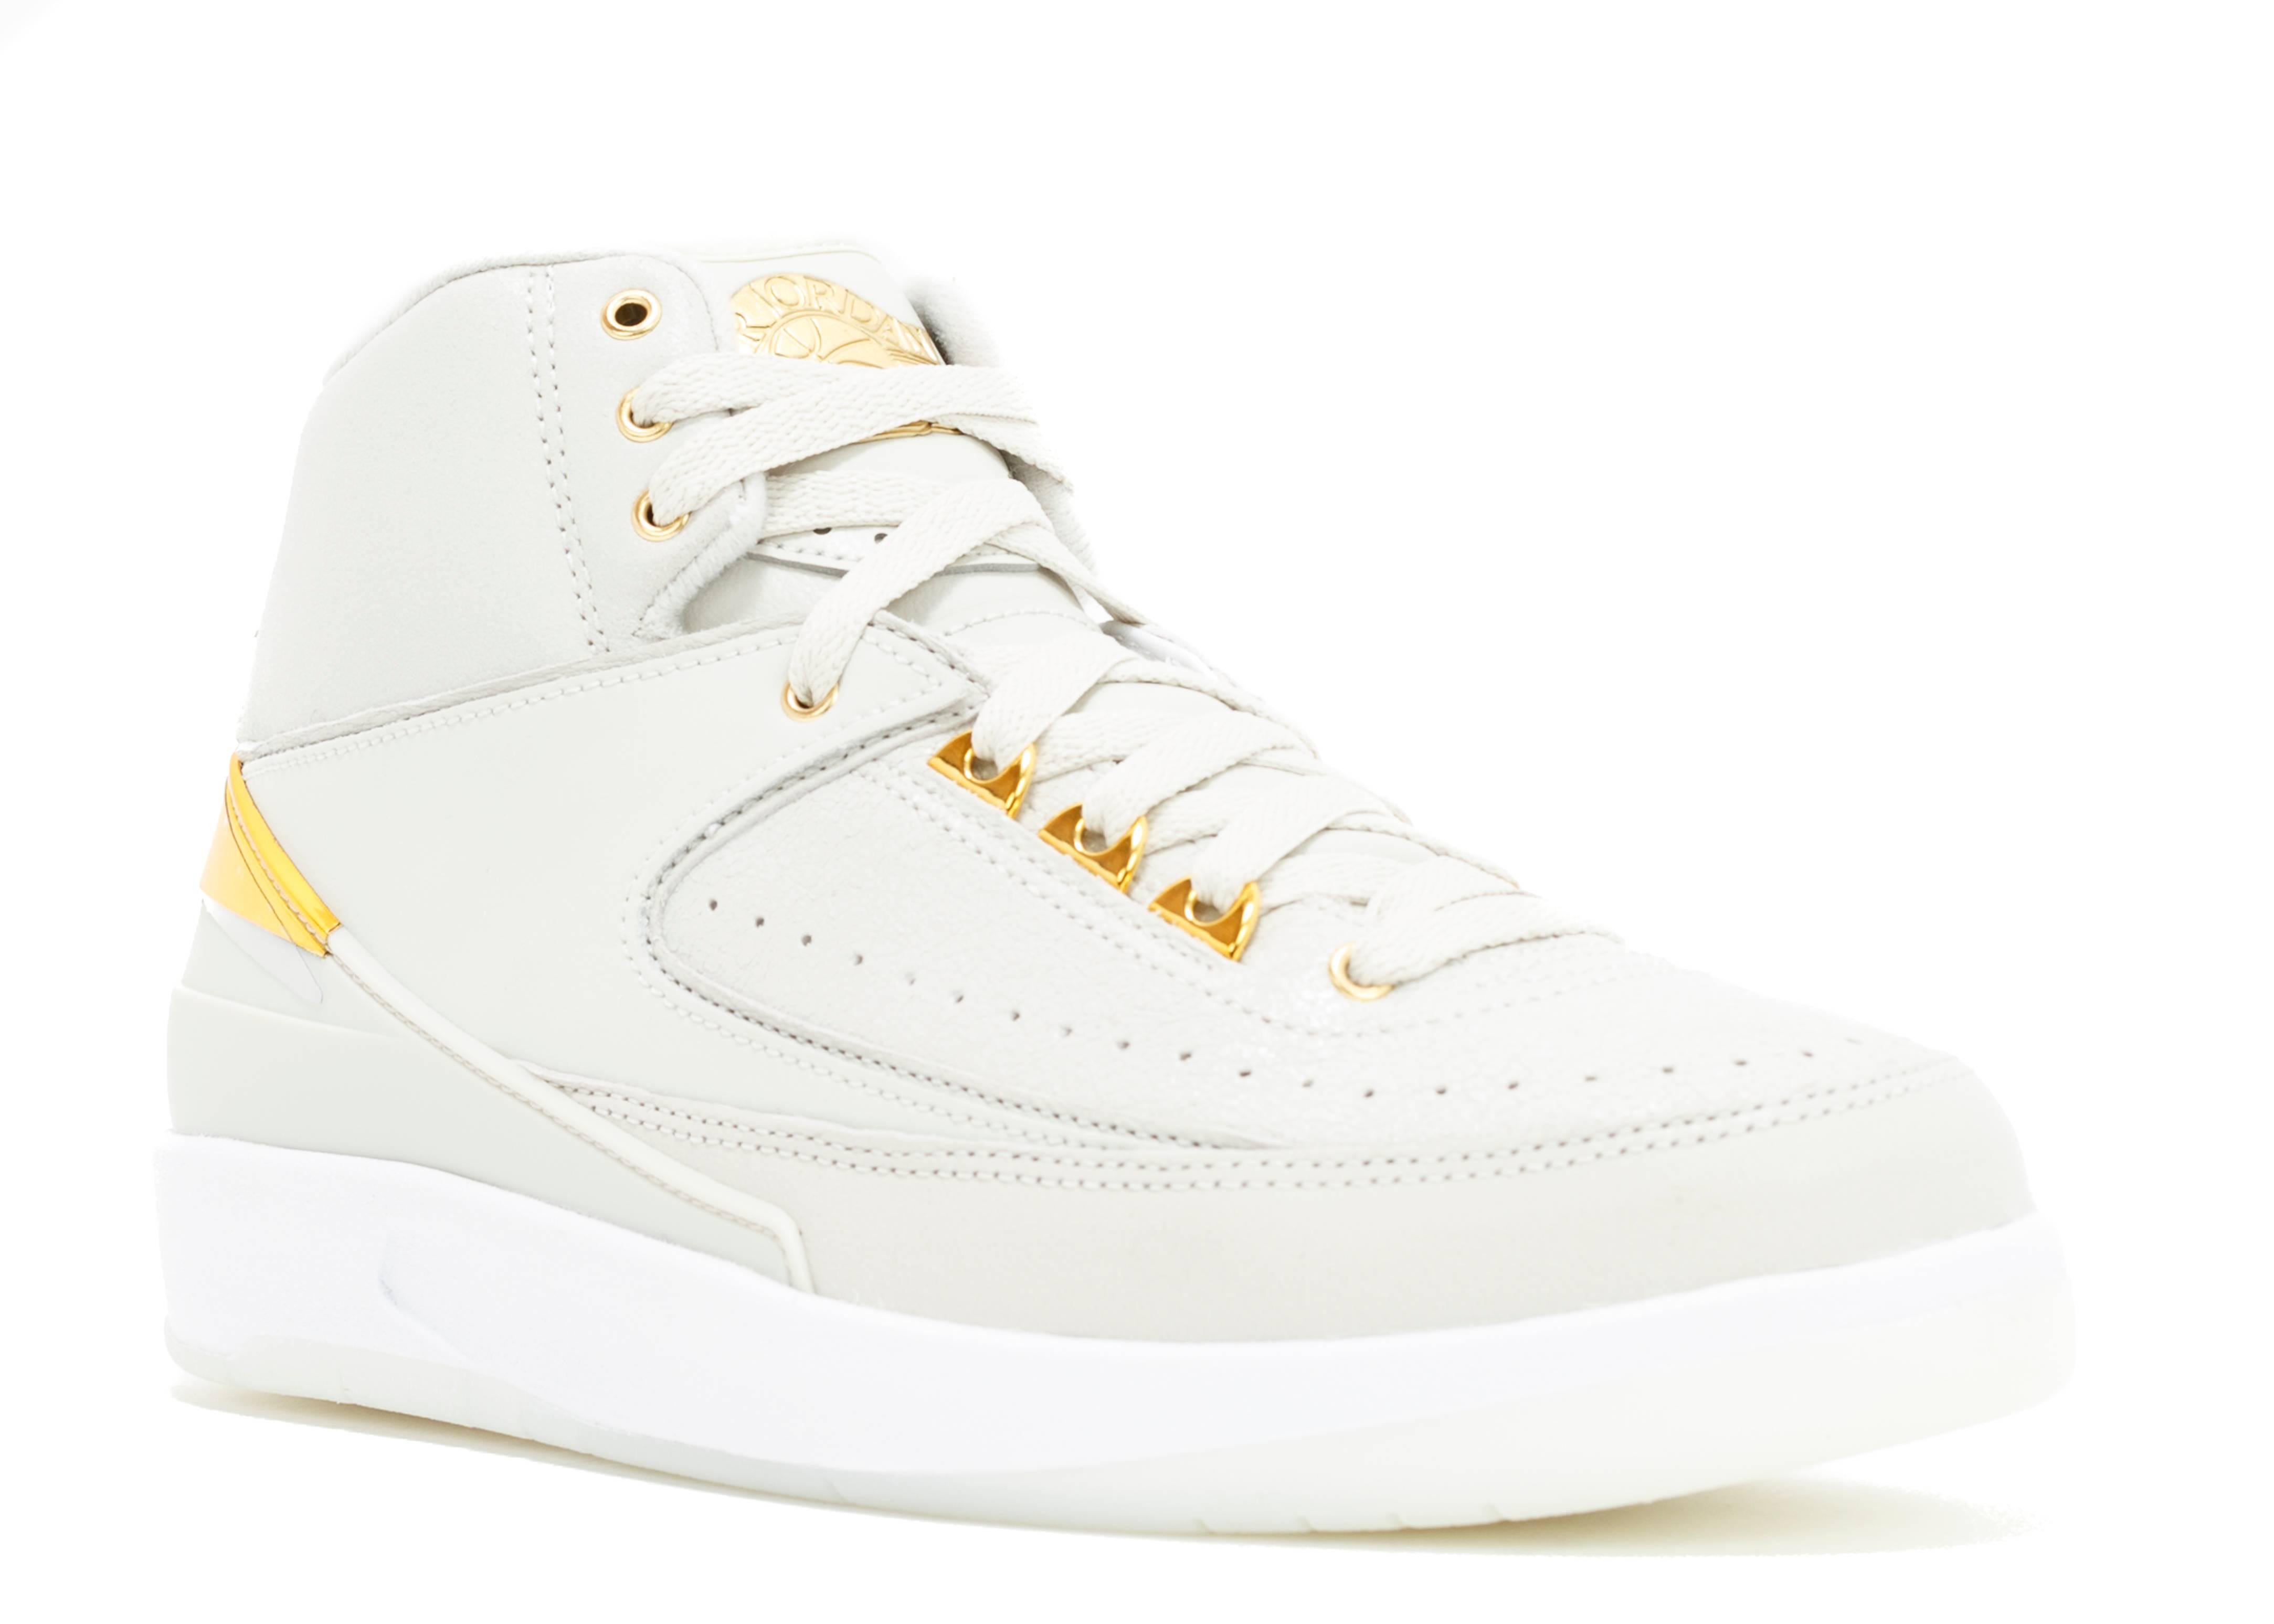 Jordans White And Gold